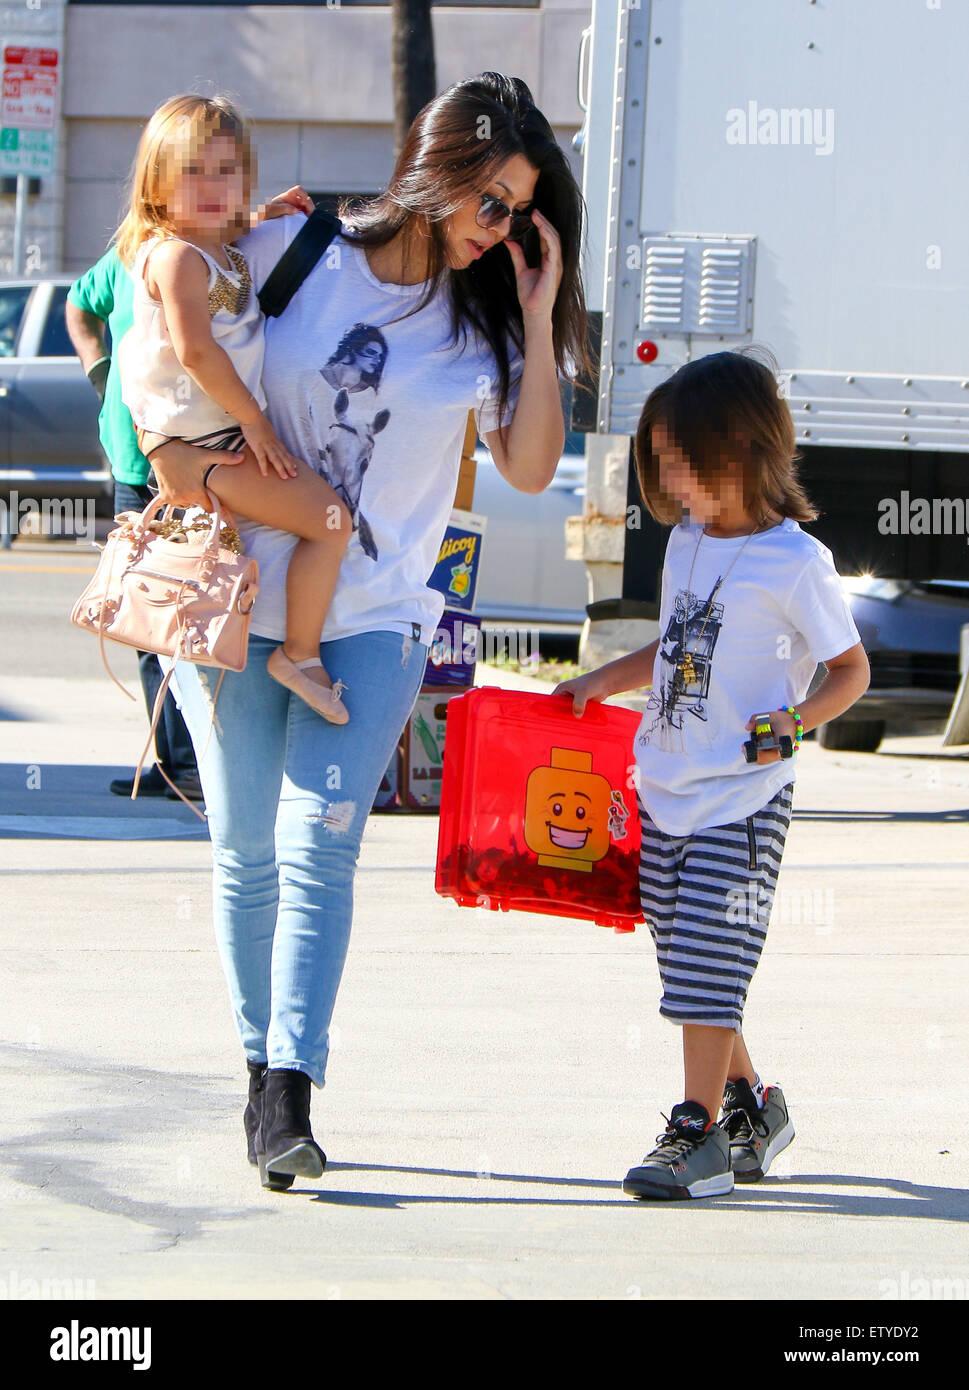 Kim Kardashian is back to black hair as she and Kourtney take their